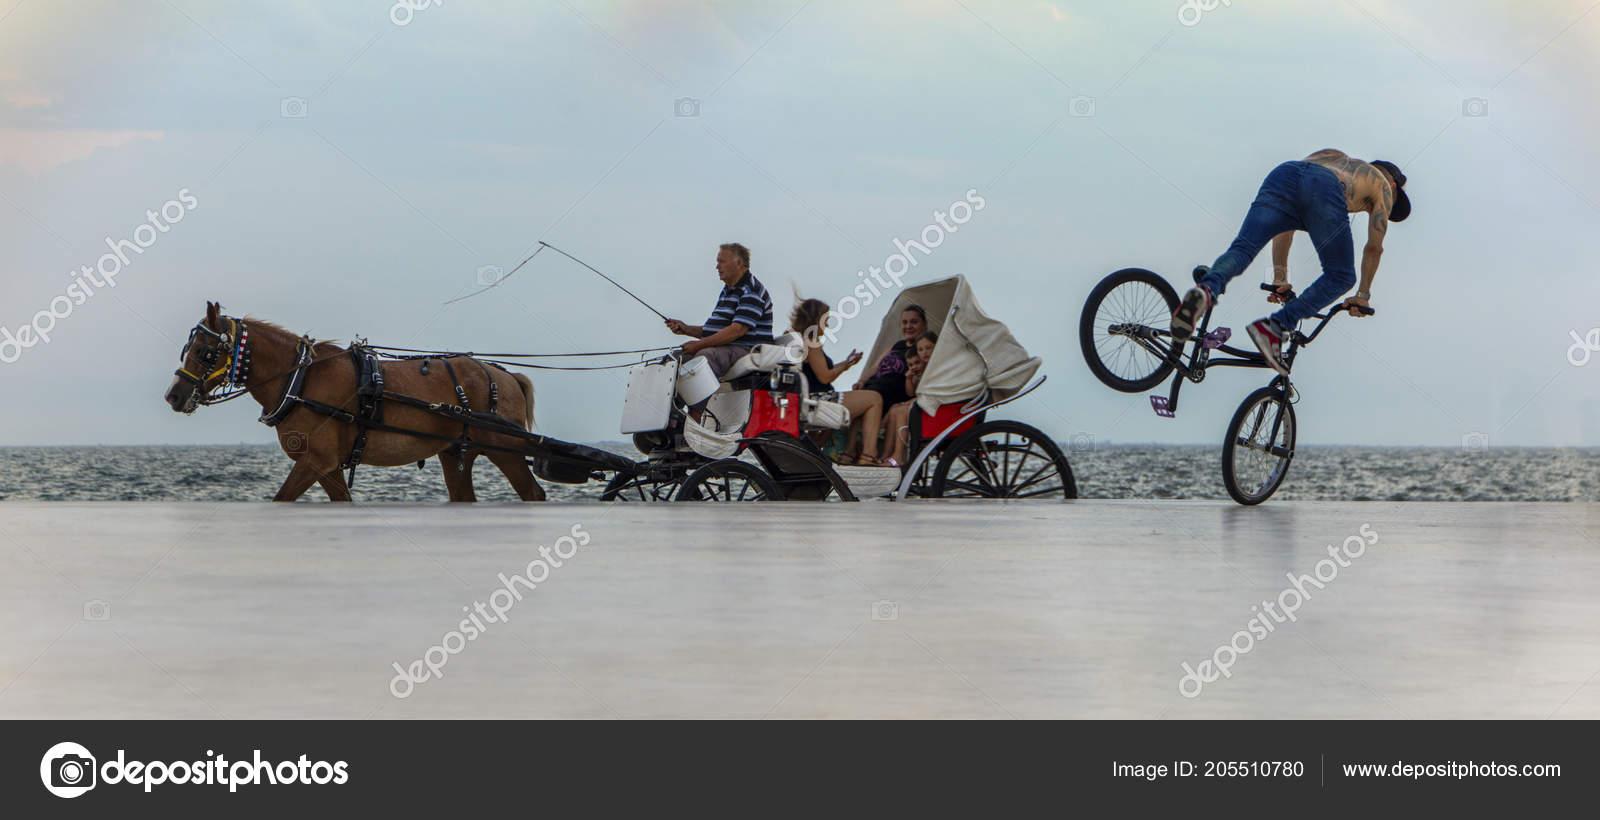 Thessaloniki Greece July 2018 Dynamic Scene Horse Coach